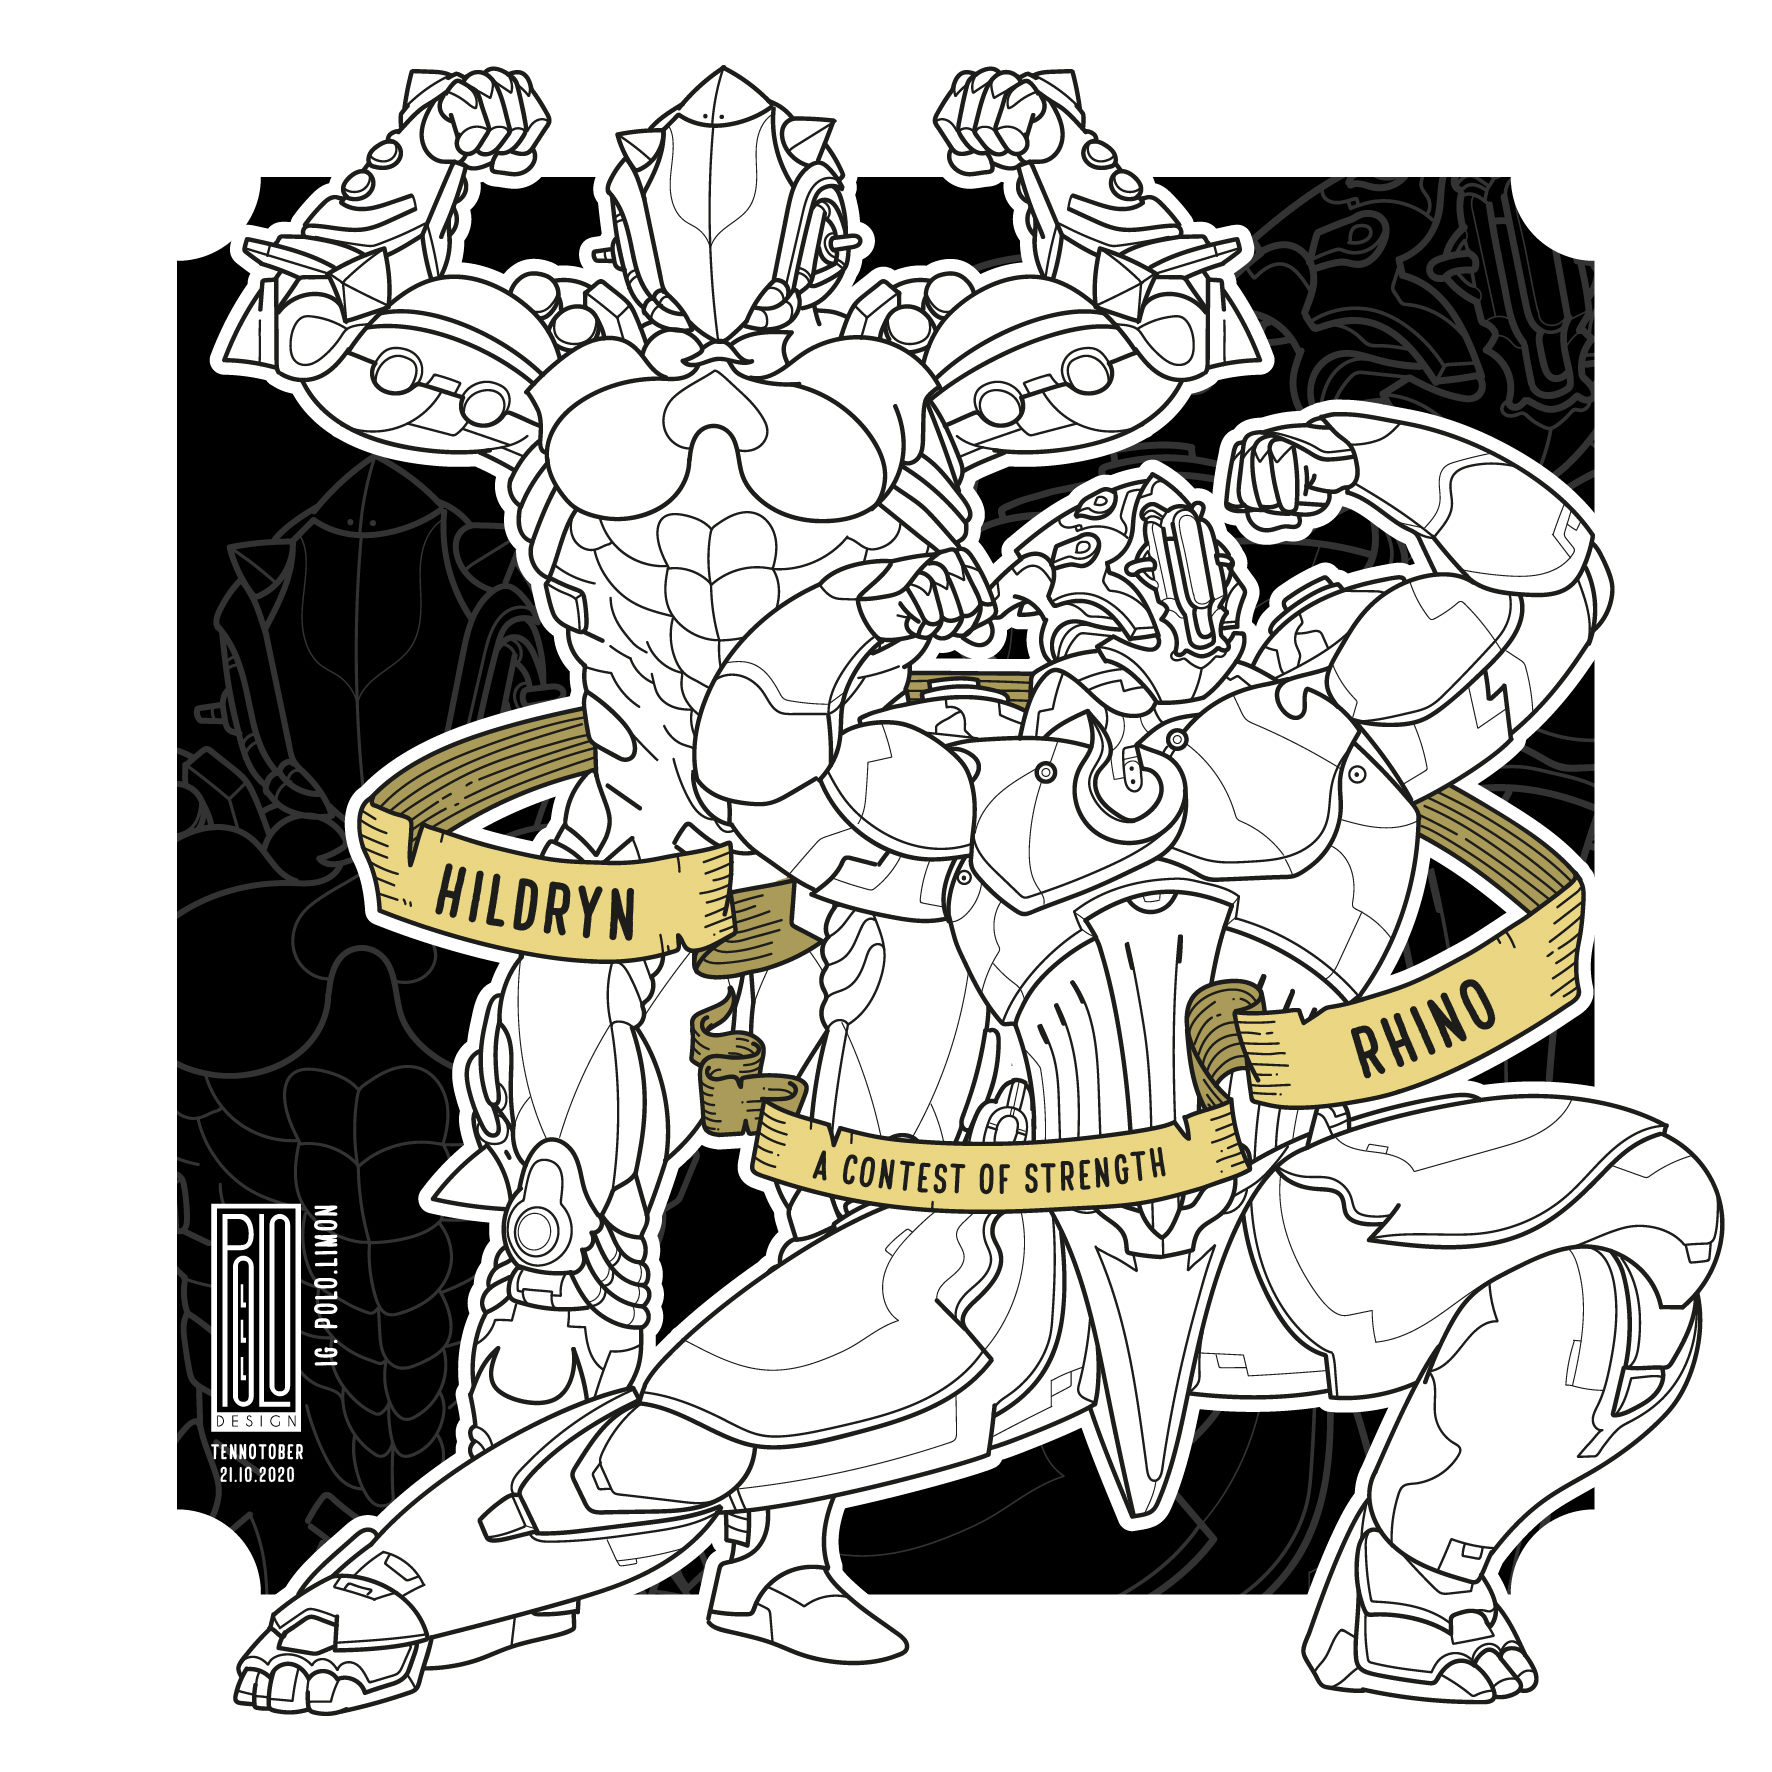 21-strength.jpg